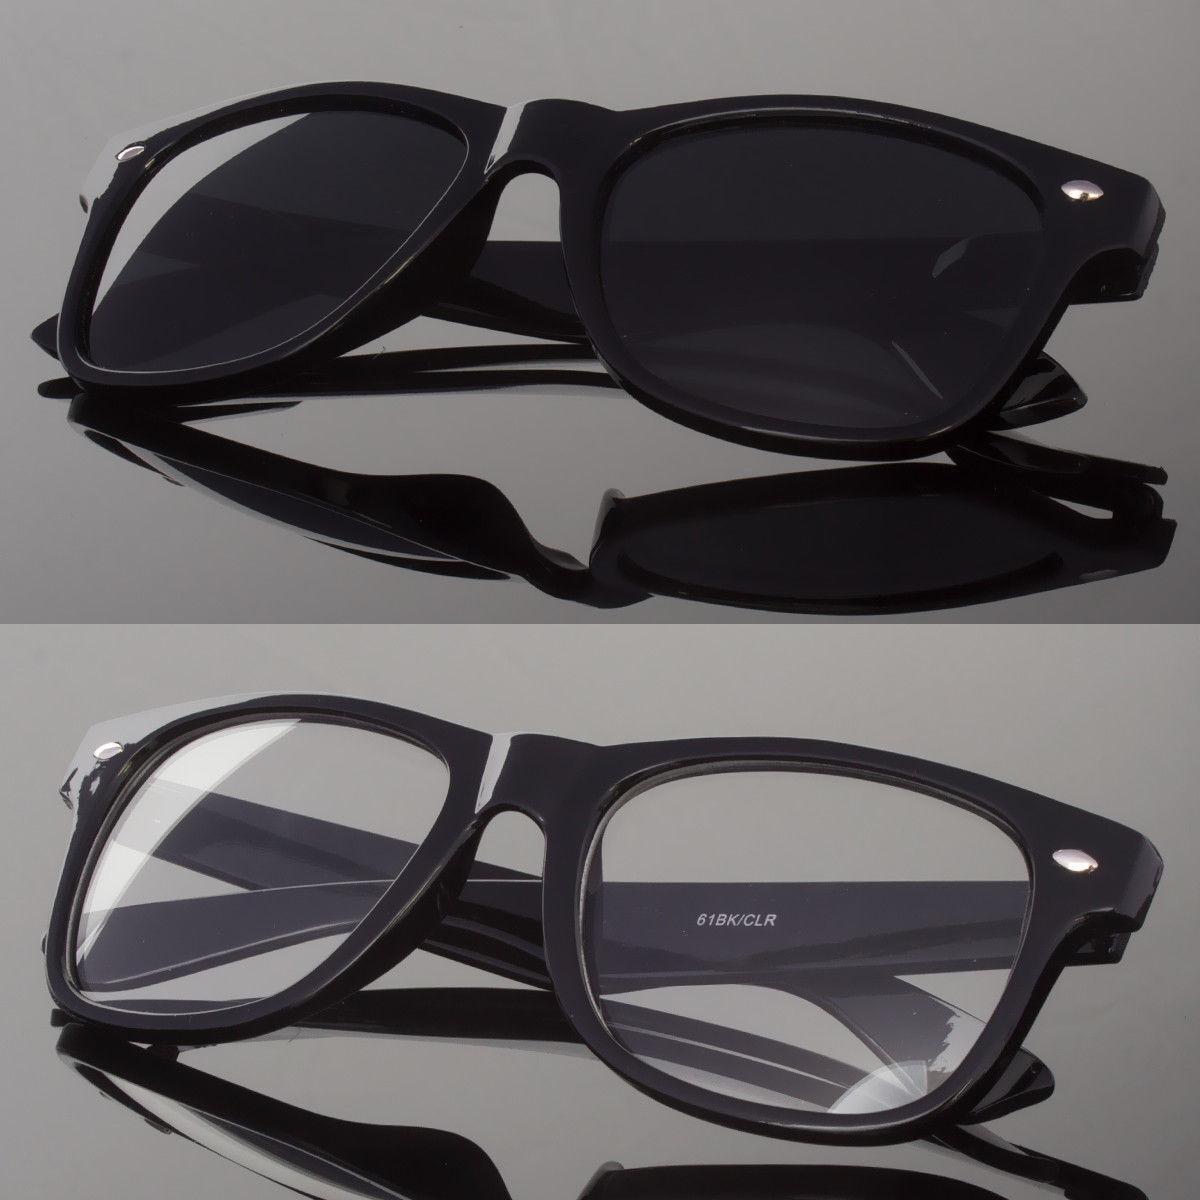 New Black or Clear Lens Sunglasses Vintage Retro Men Women C